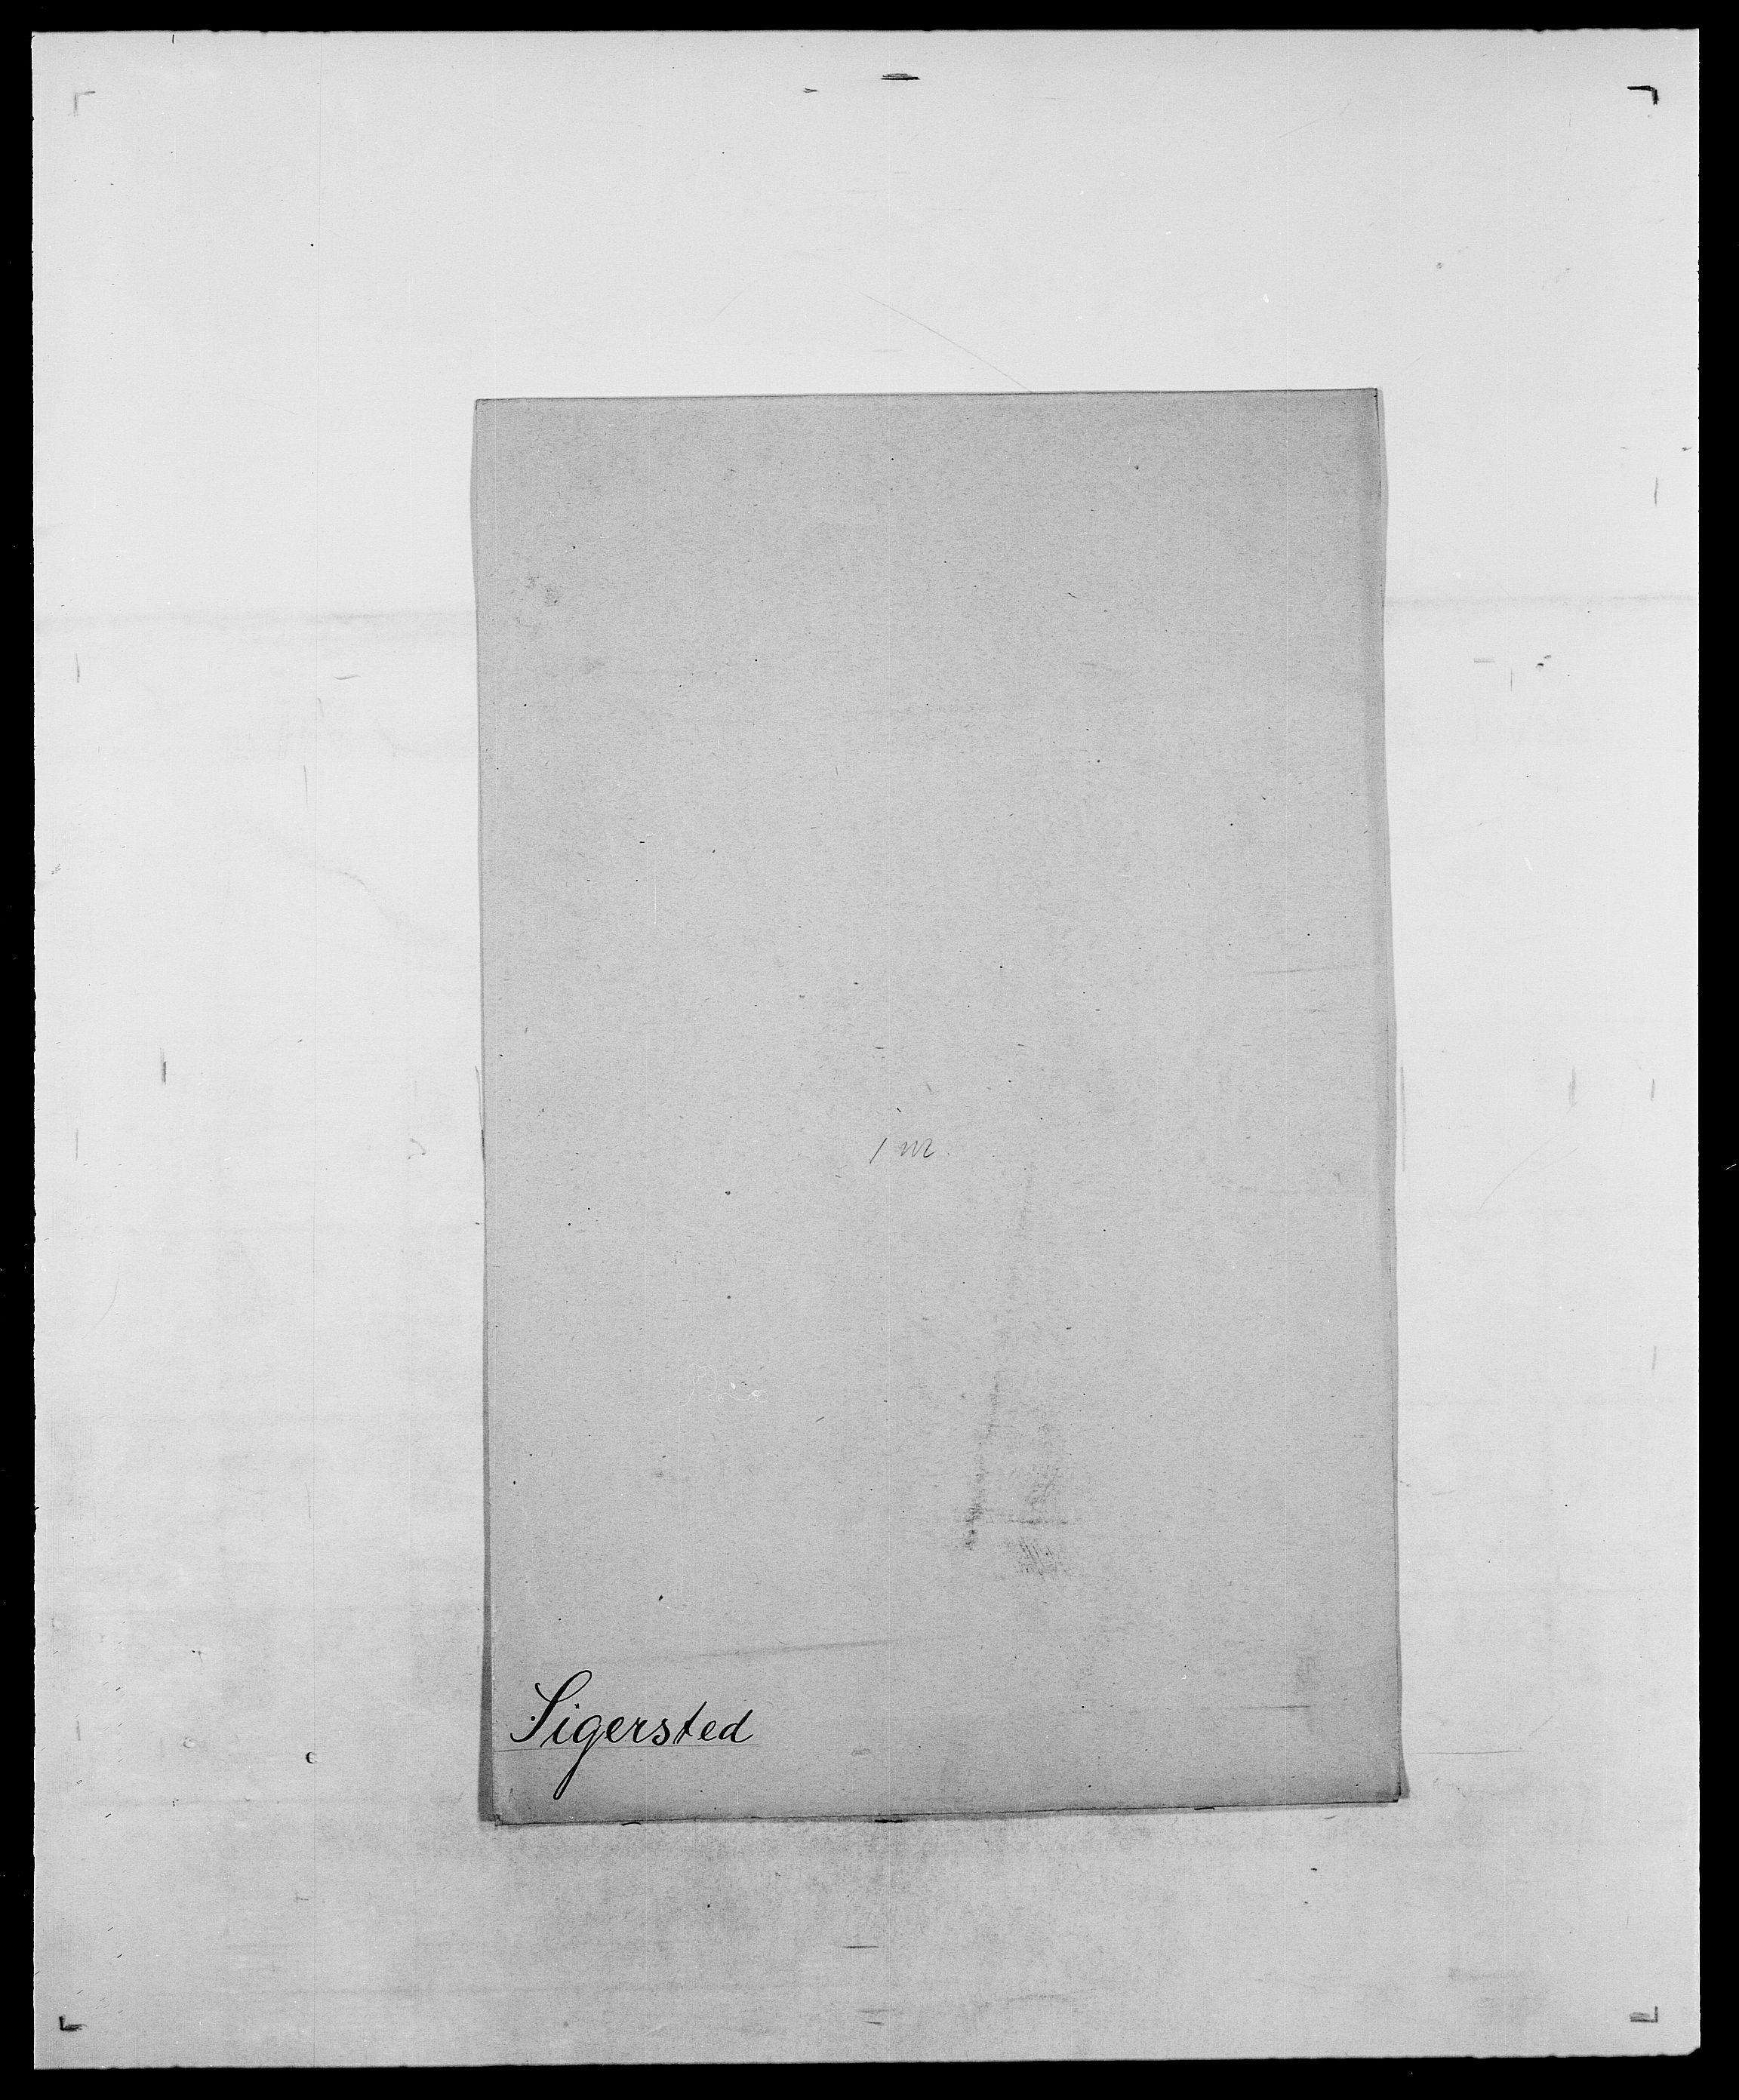 SAO, Delgobe, Charles Antoine - samling, D/Da/L0035: Schnabel - sjetman, s. 782